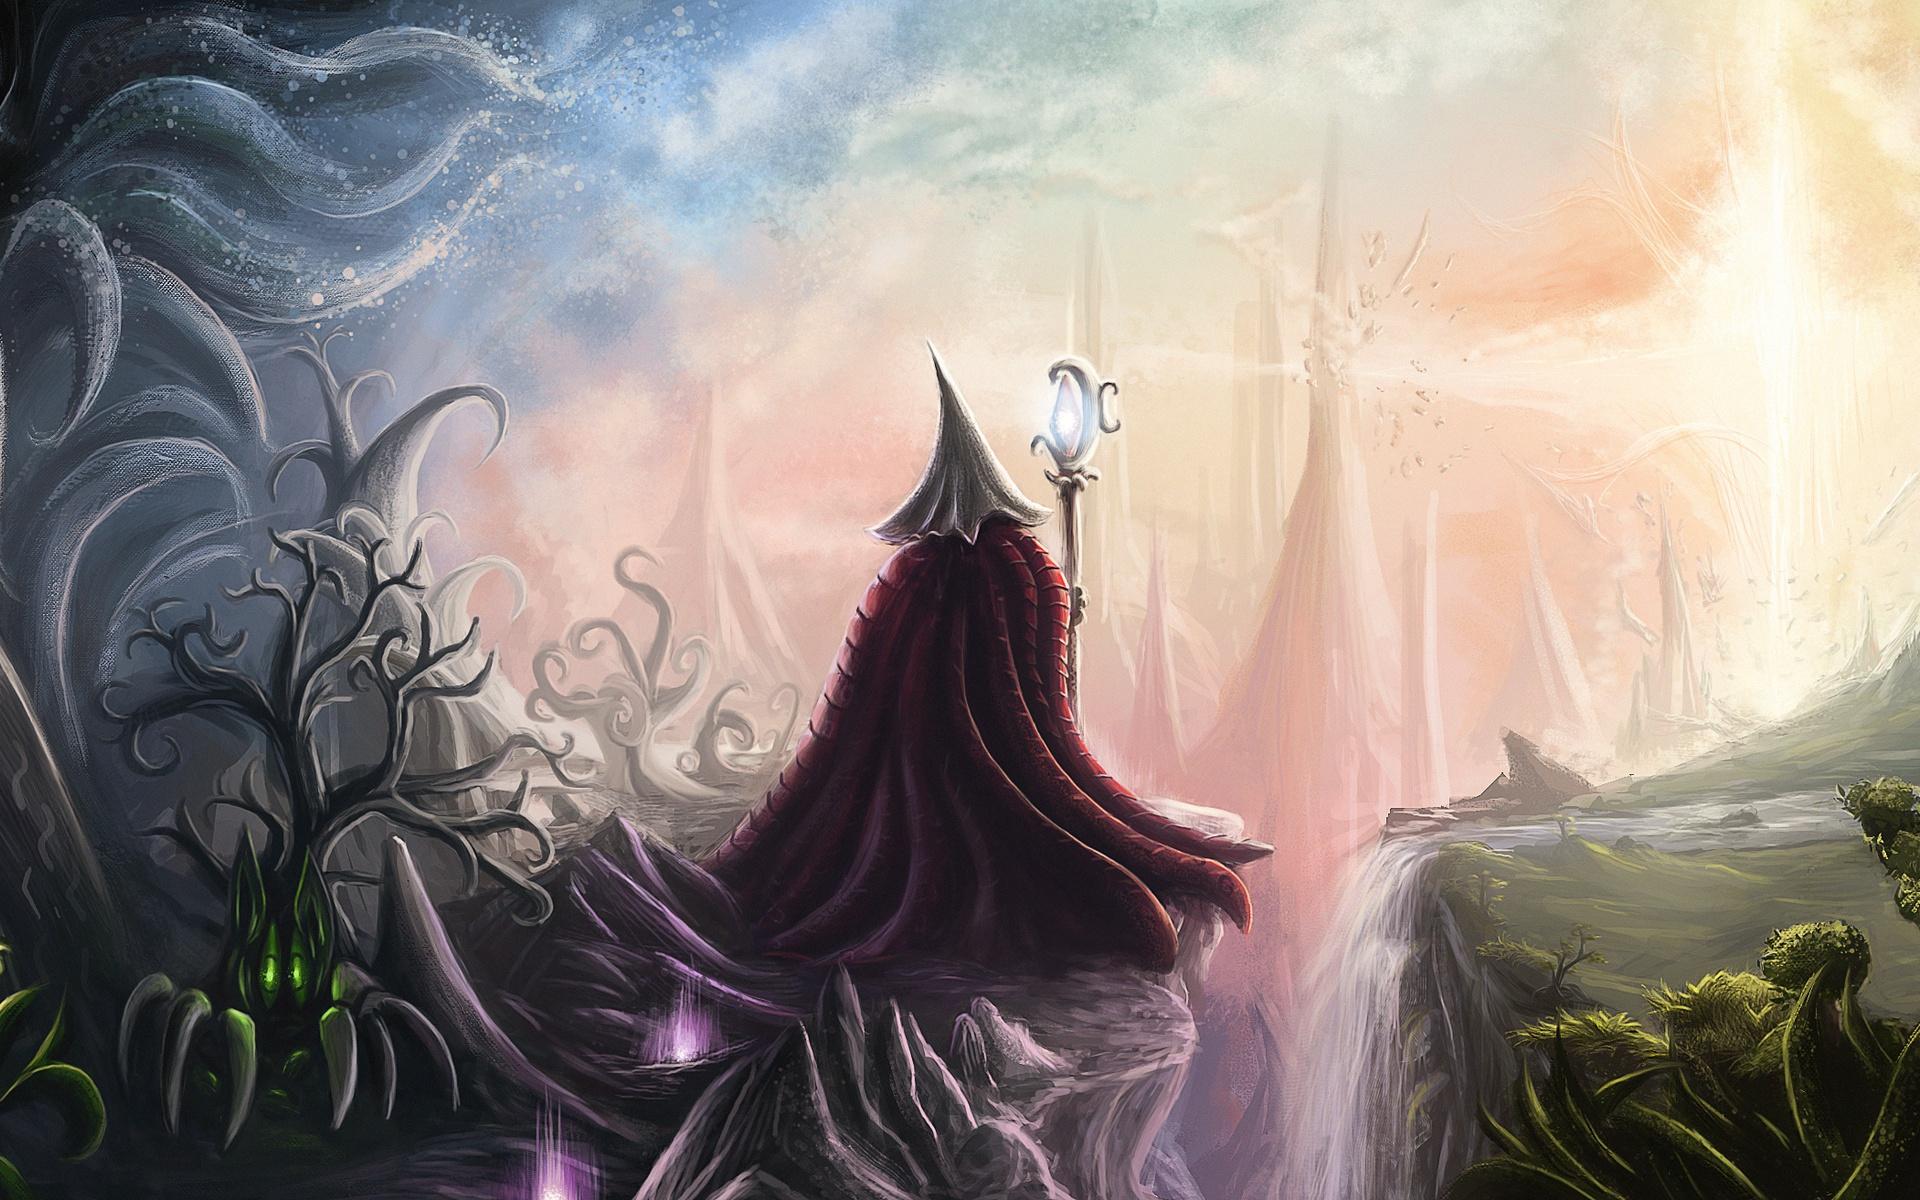 Artwork Fantasy Art Staff Plants Magic Waterfall Landscape 1920x1200